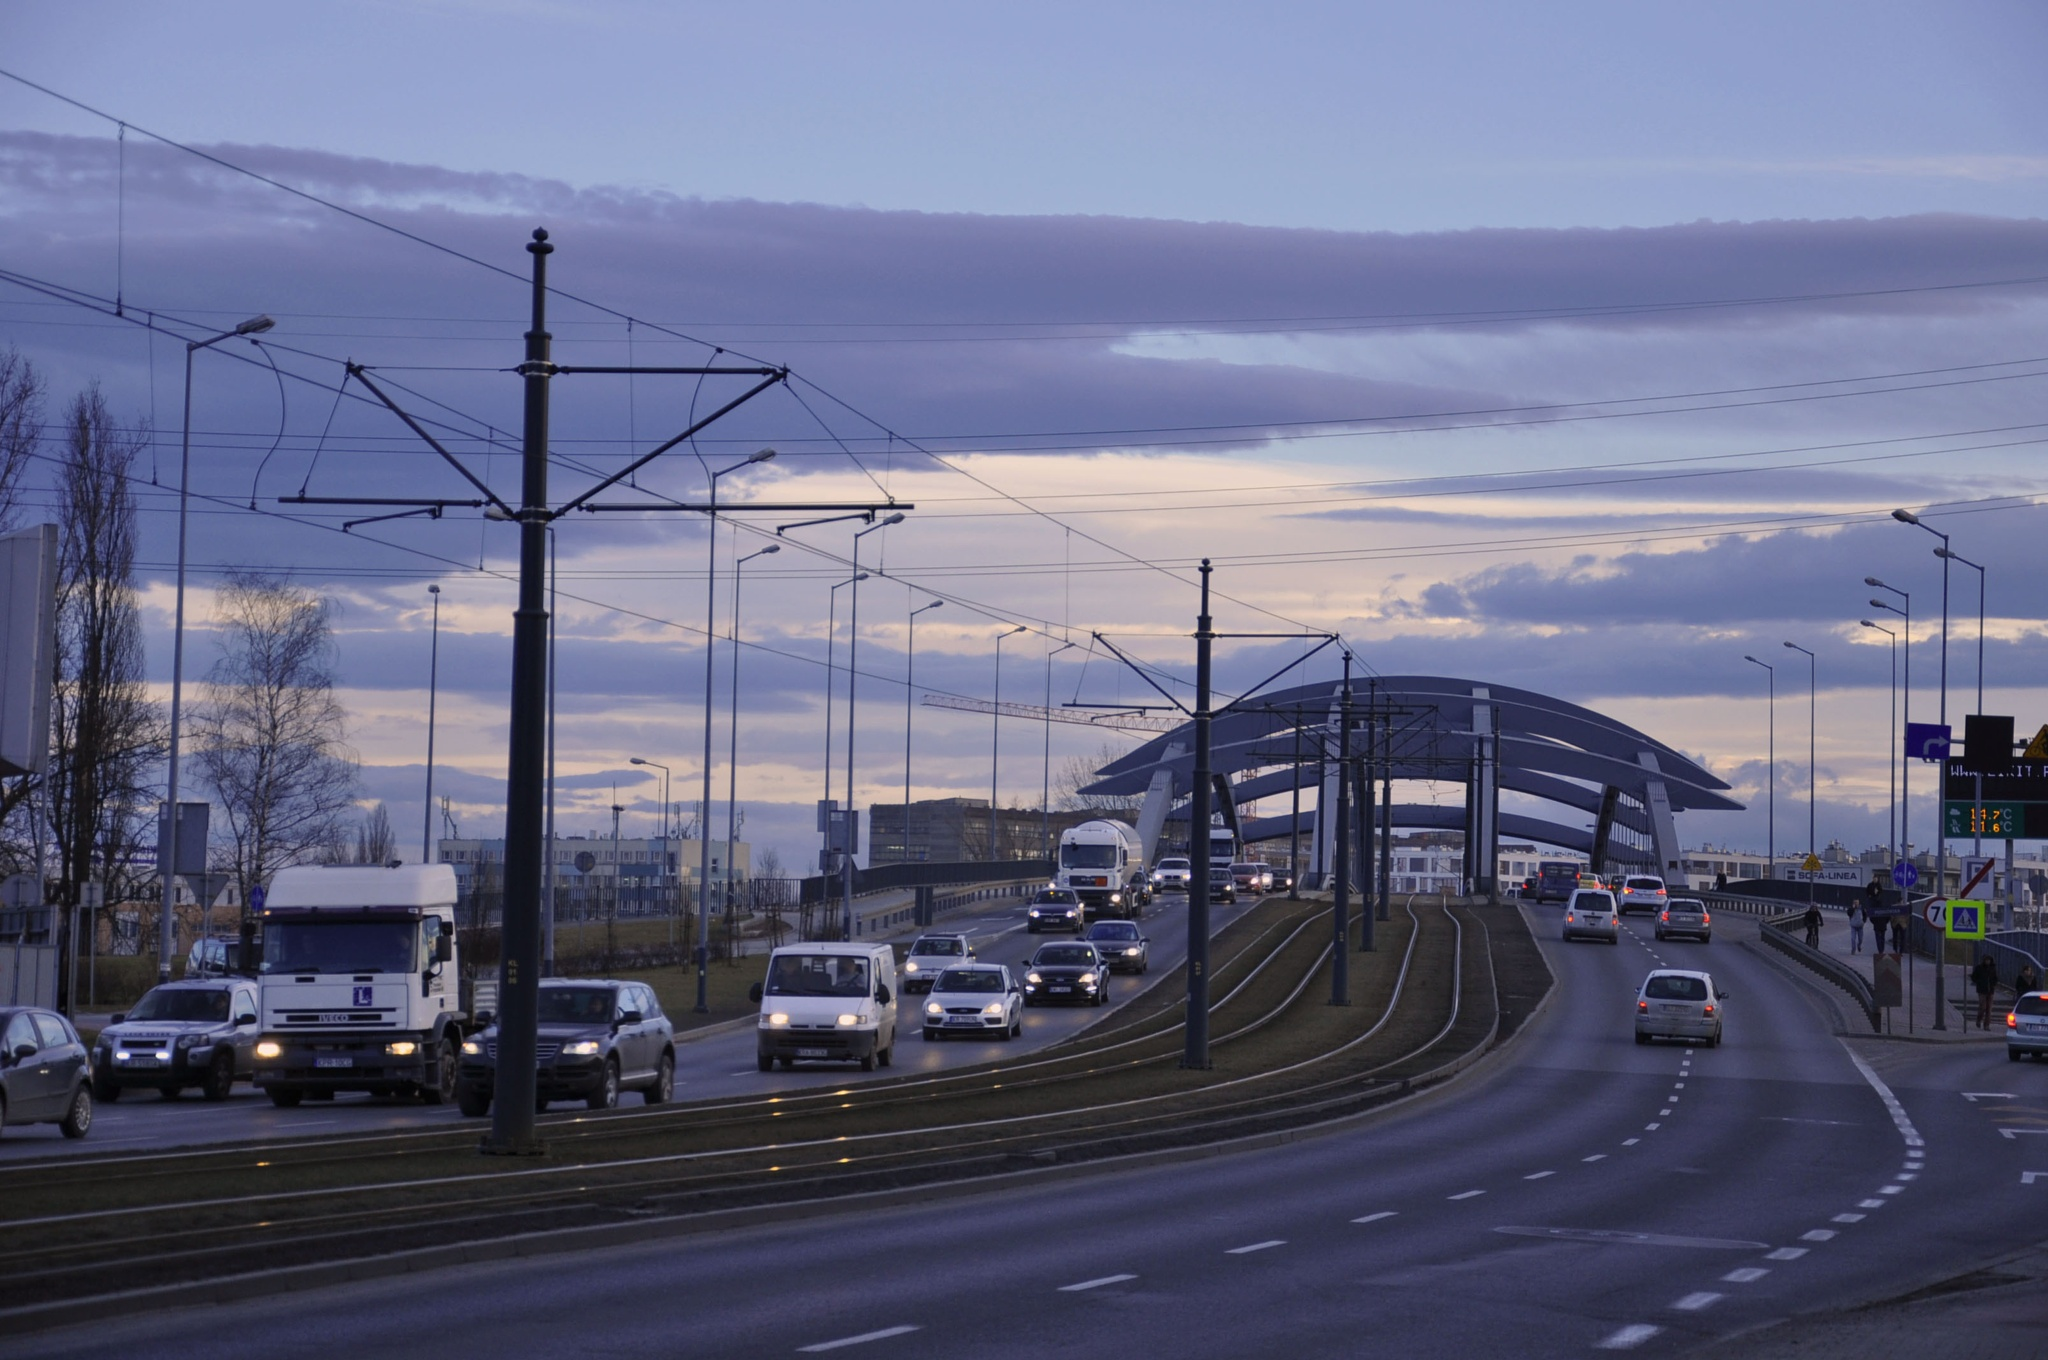 The Bridge in Cracow by Ali Bahceli